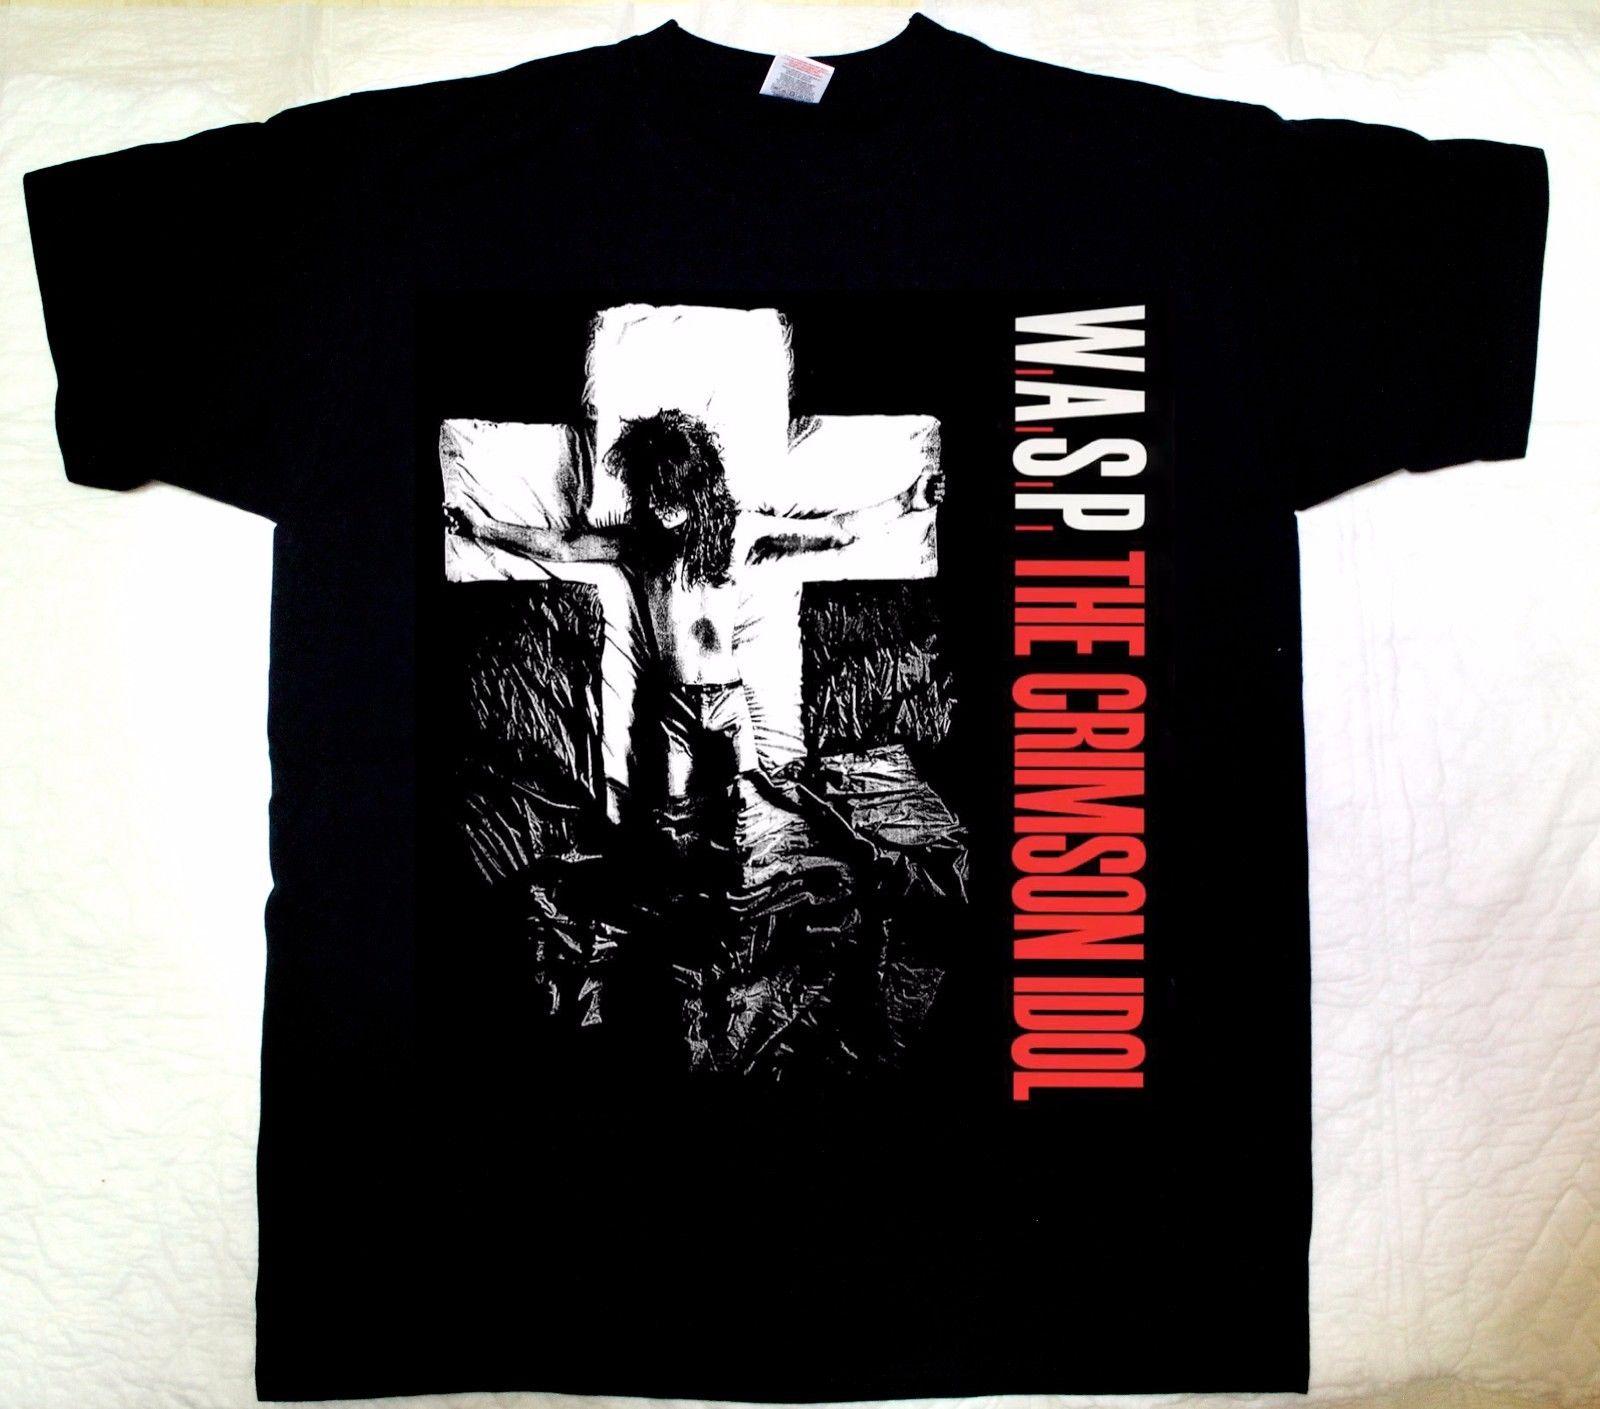 W.A.S.P. CRIMSON IDOL92 HEAVY METAL BAND WASP TWISTED SISTER NEW BLACK T-SHIRT Fashion T-Shirts Summer Straight 100% Cotton